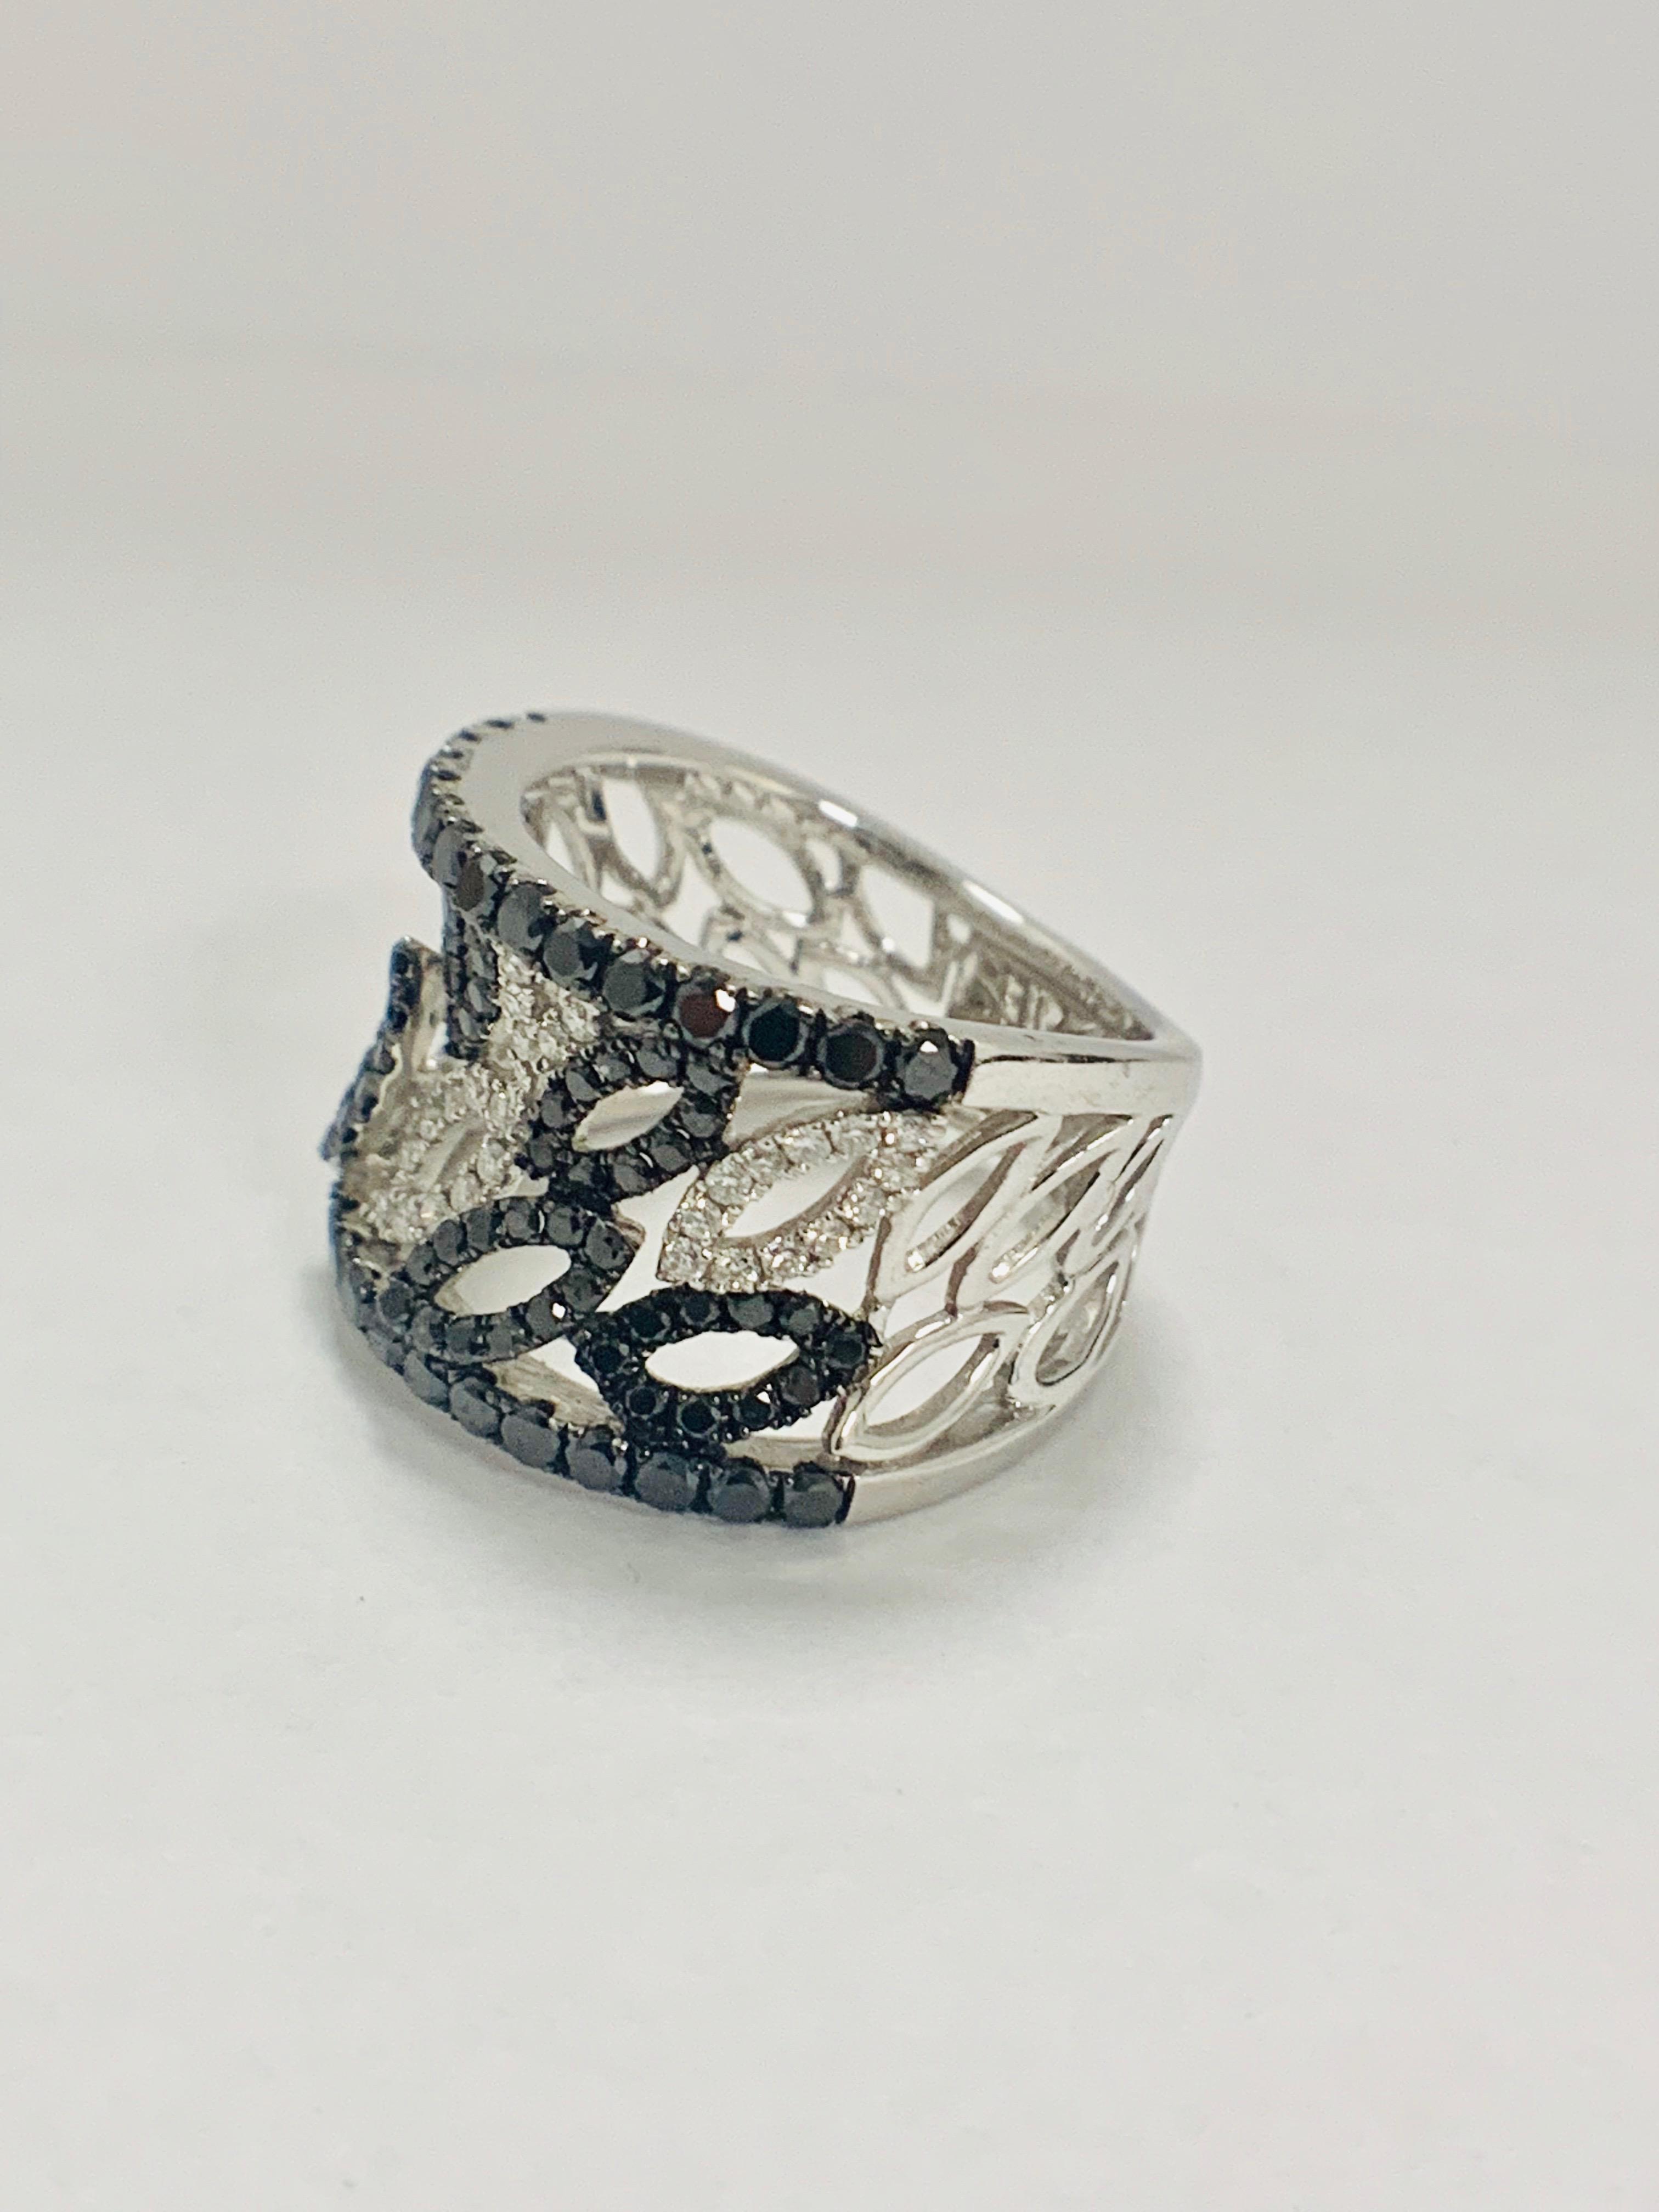 18ct White Gold Diamond ring featuring 90 round cut, black Diamonds (1.14ct TBDW) - Image 6 of 15